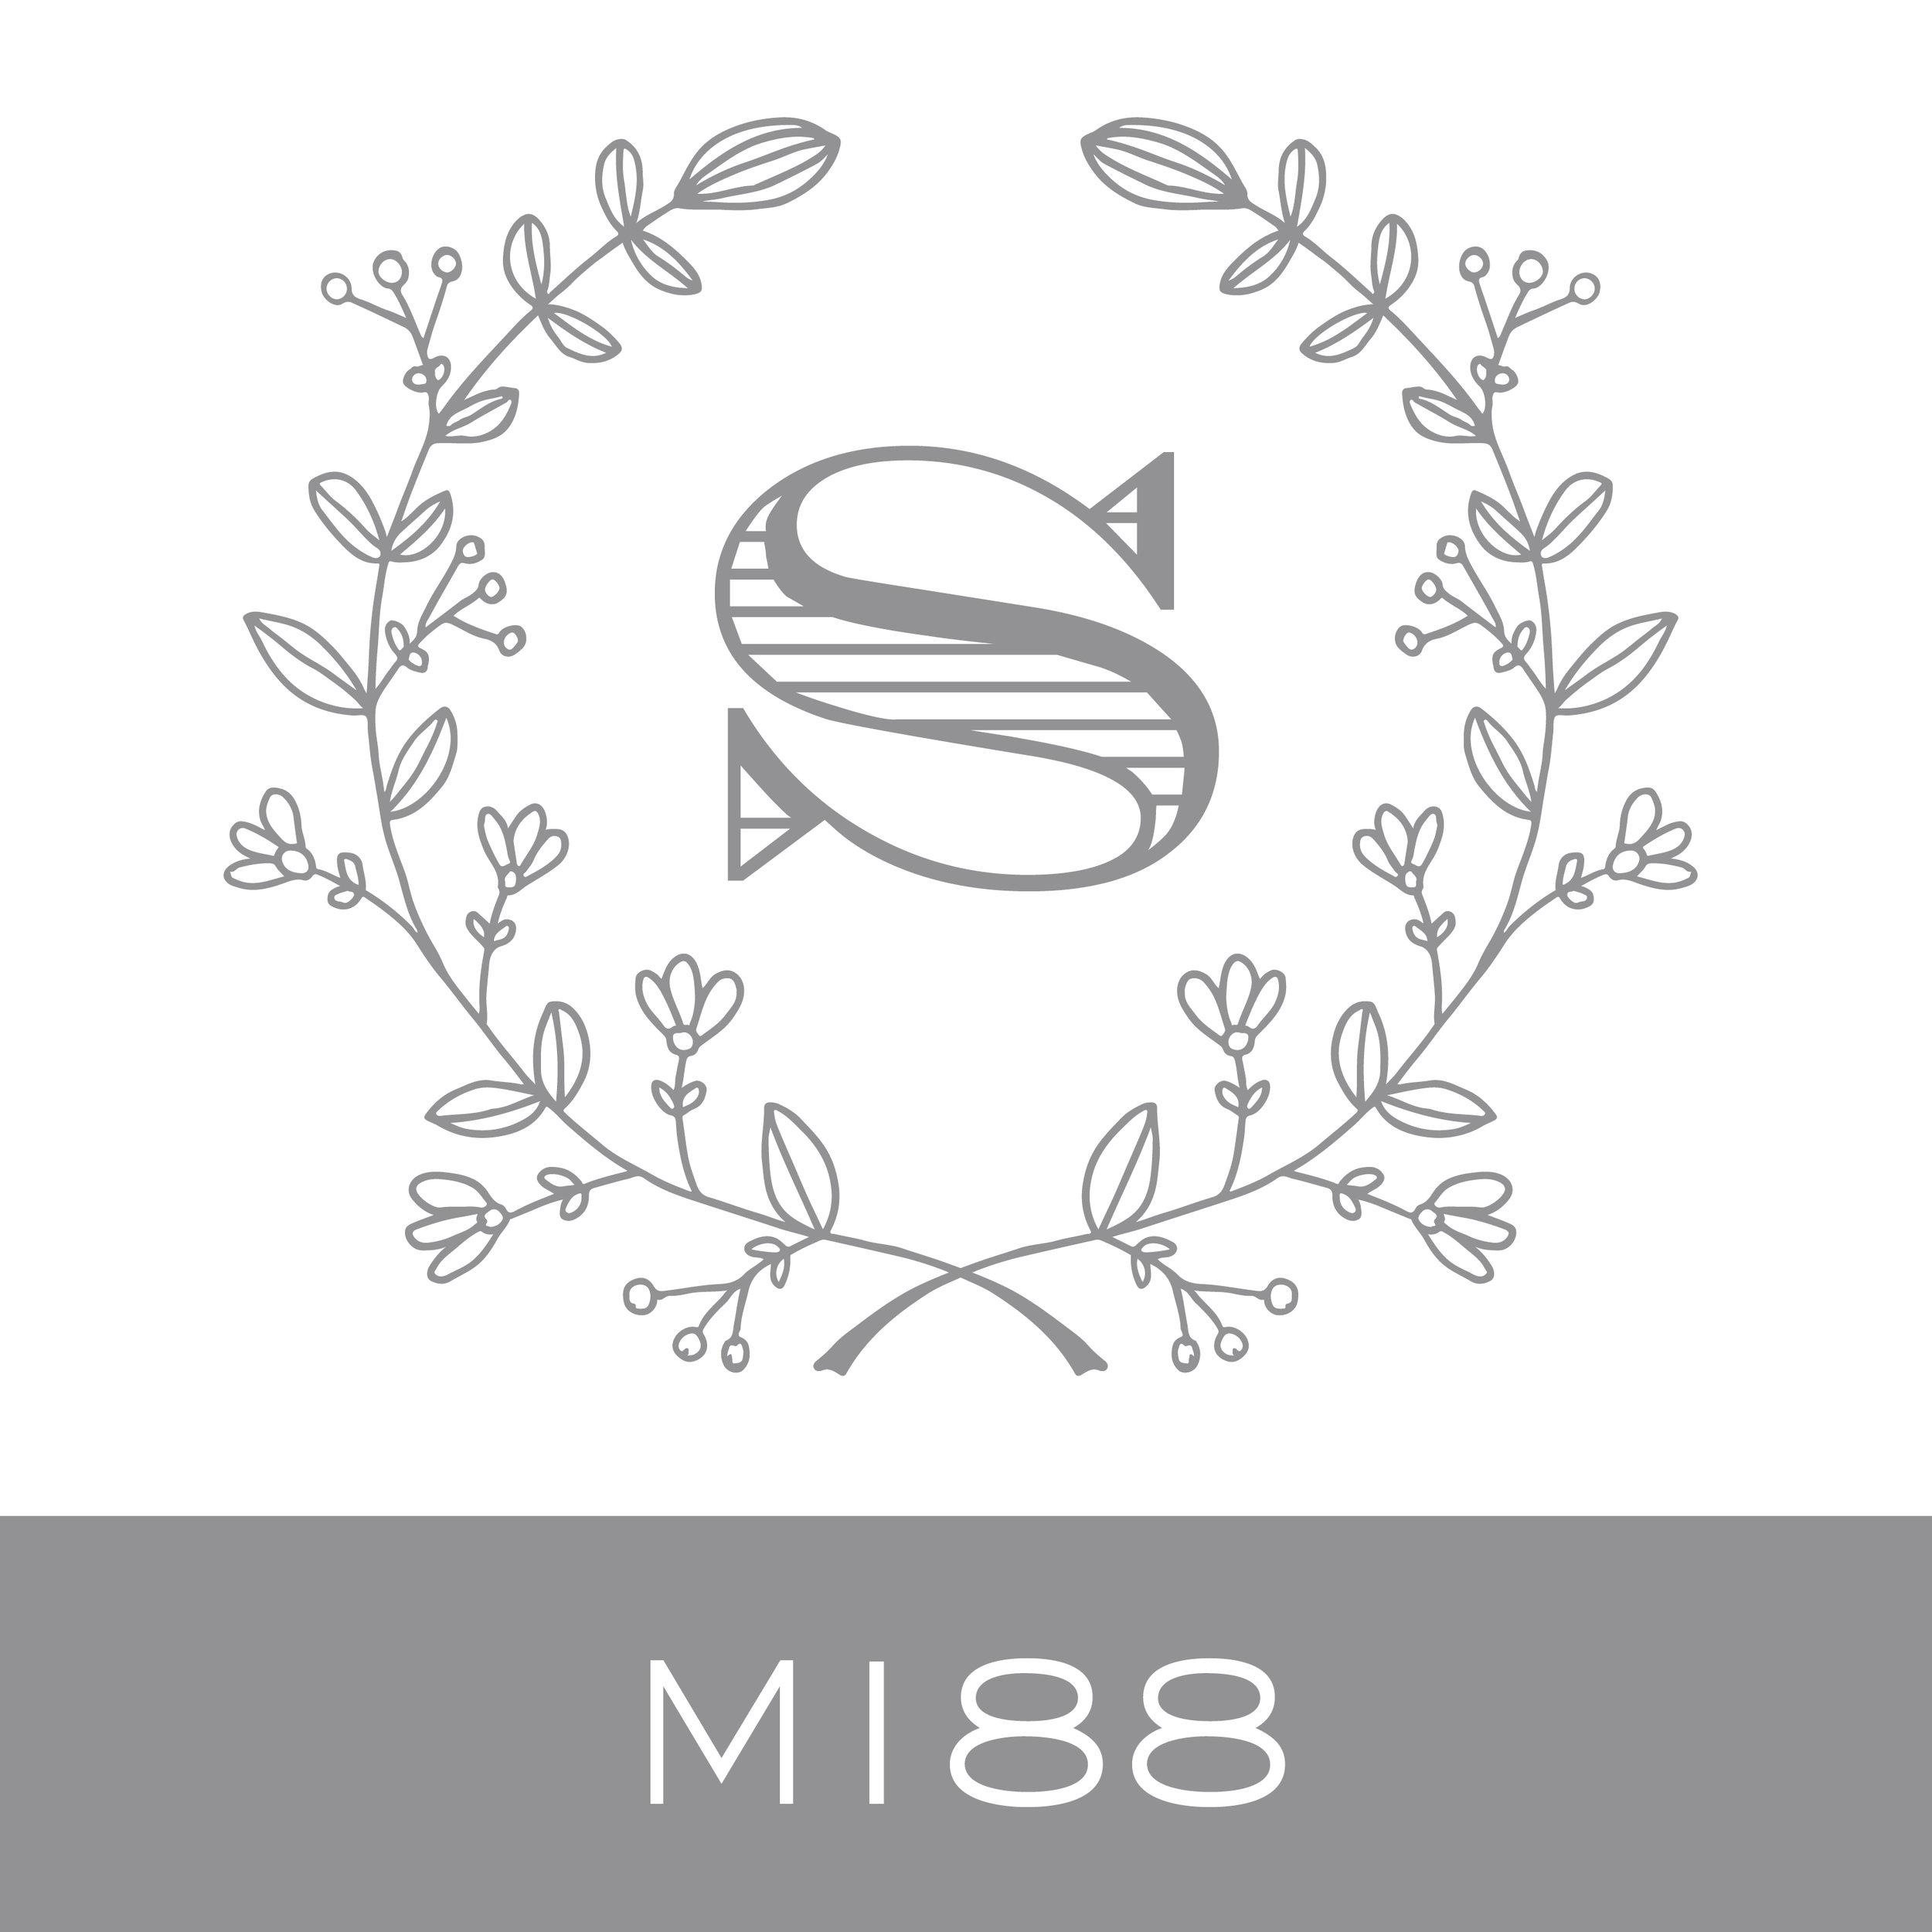 M188.jpg